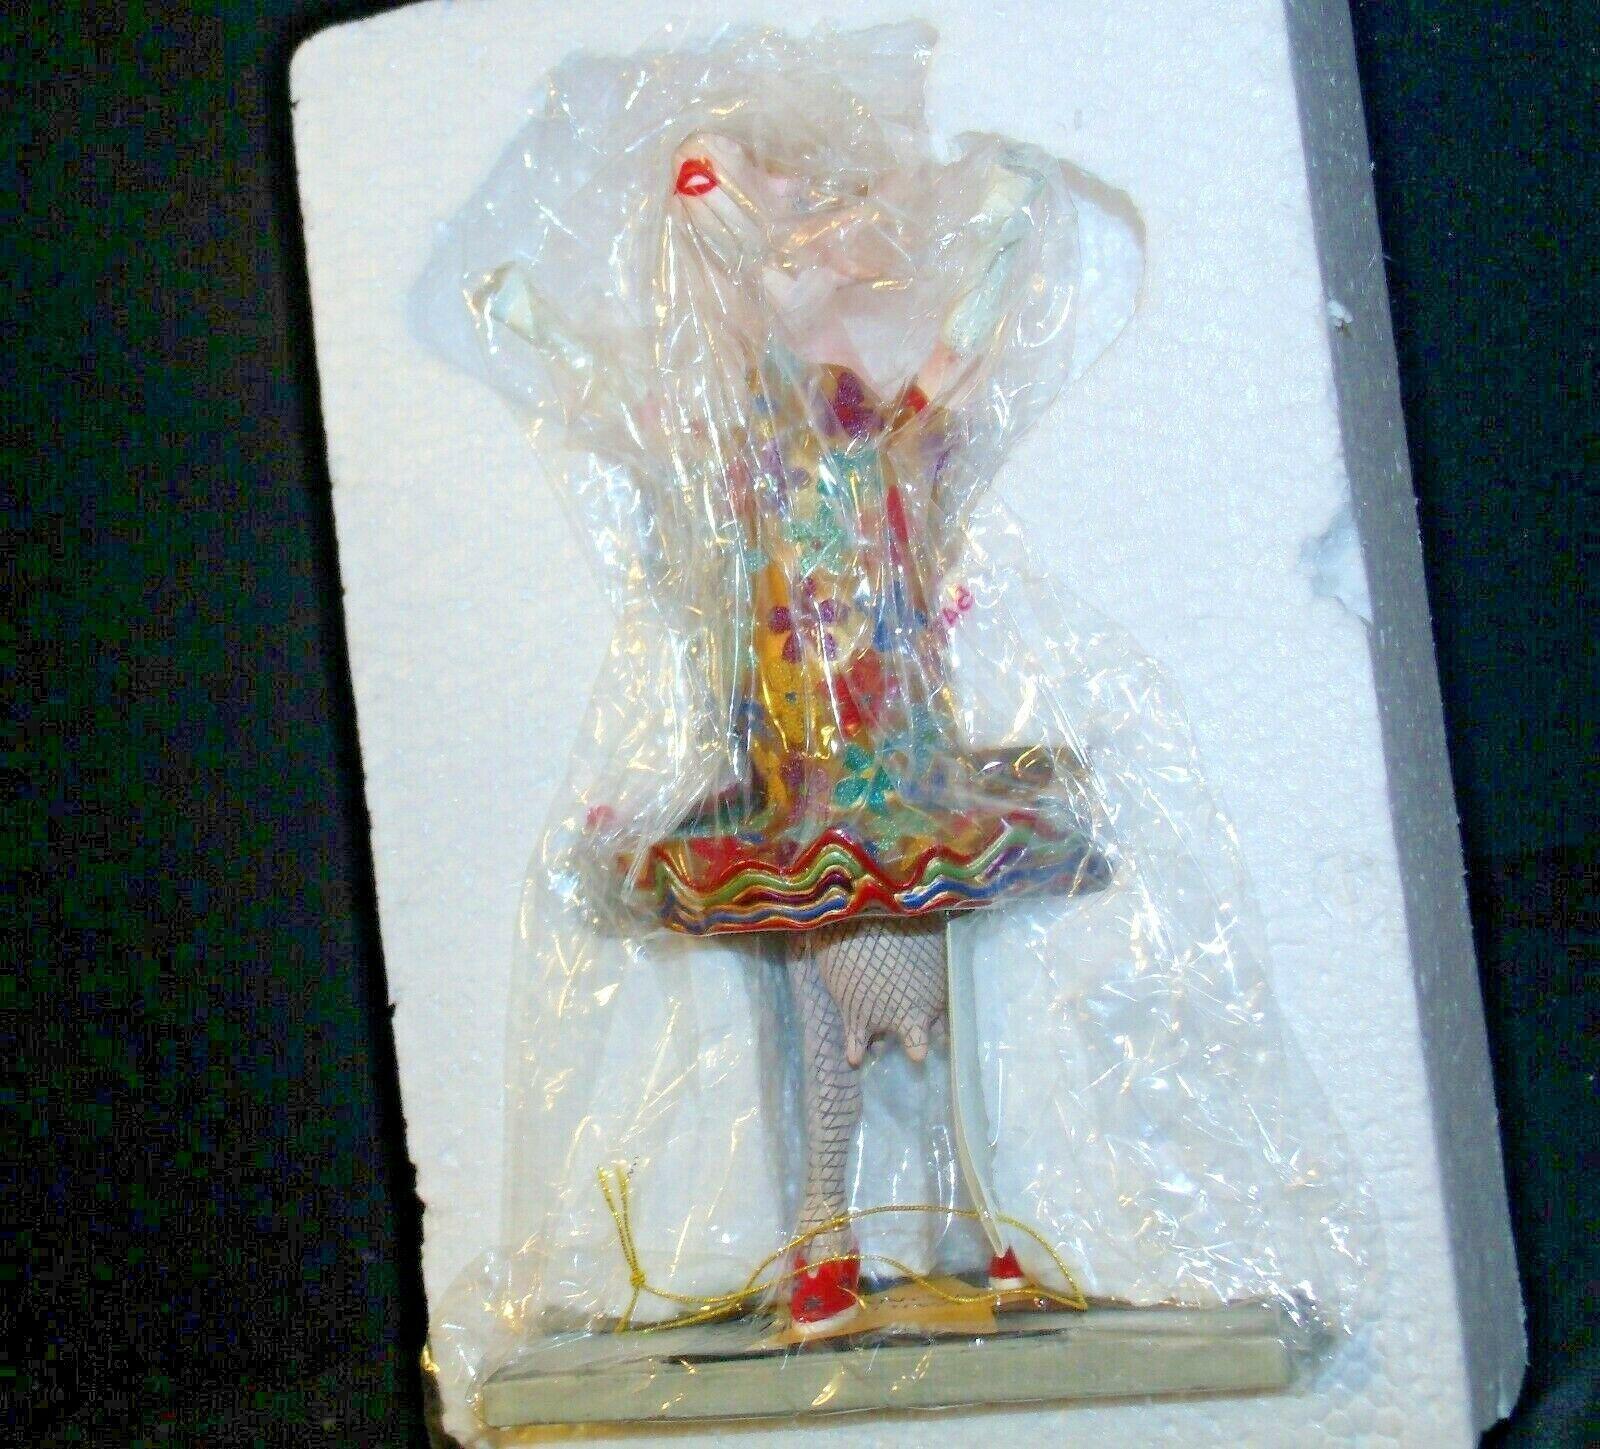 CowParade Dancing Diva Item # 9132 Westland Giftware AA-191940 Collectible (Res